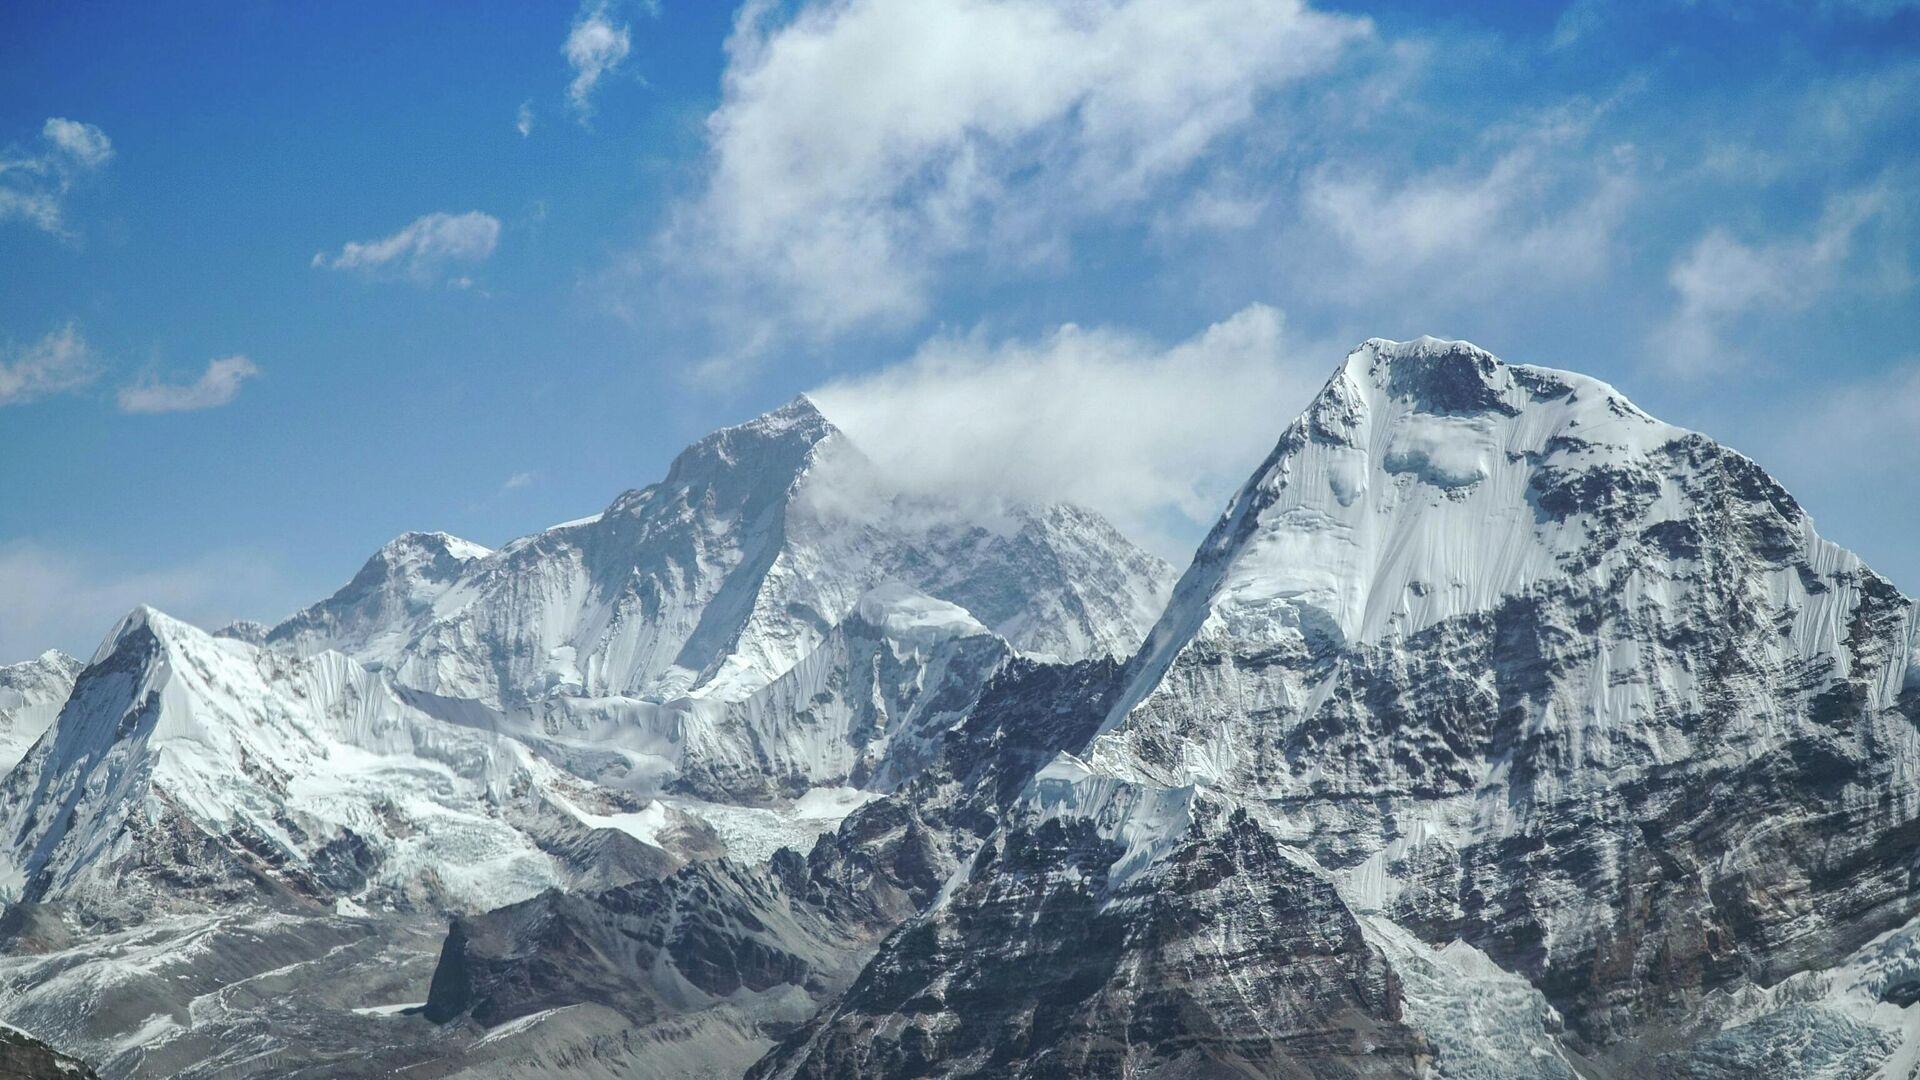 El Himalaya - Sputnik Mundo, 1920, 01.03.2021